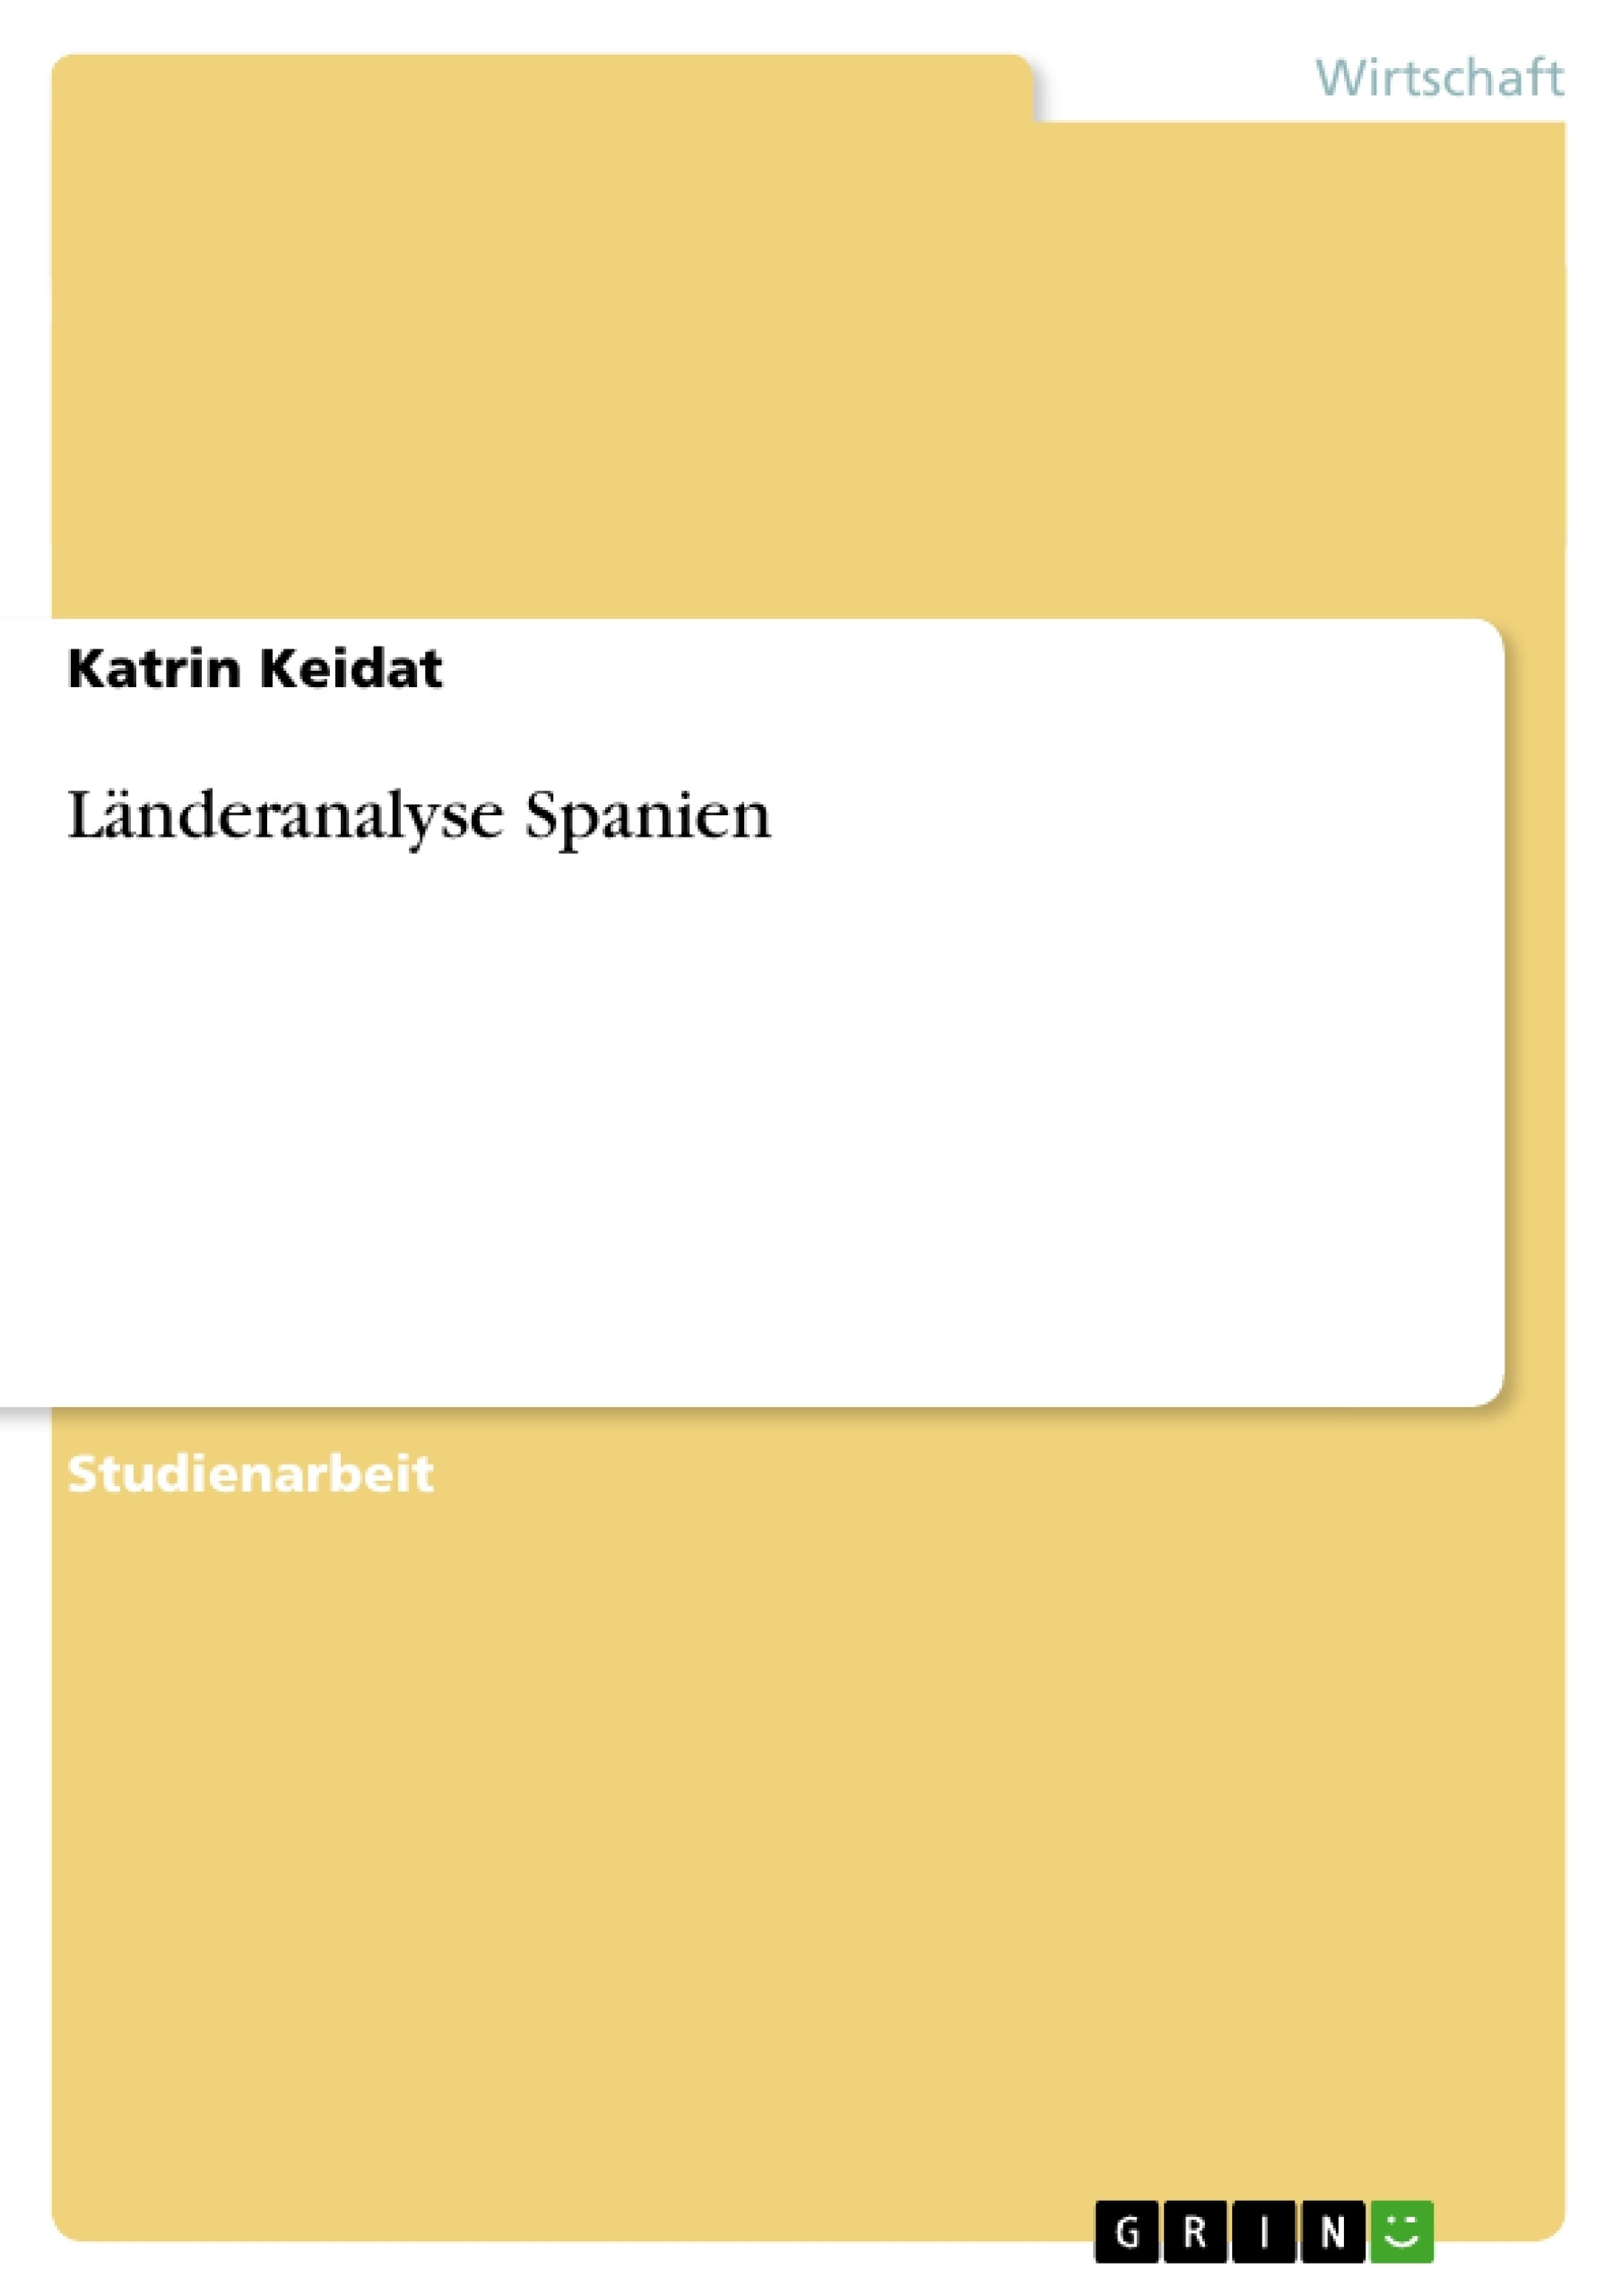 Titel: Länderanalyse Spanien